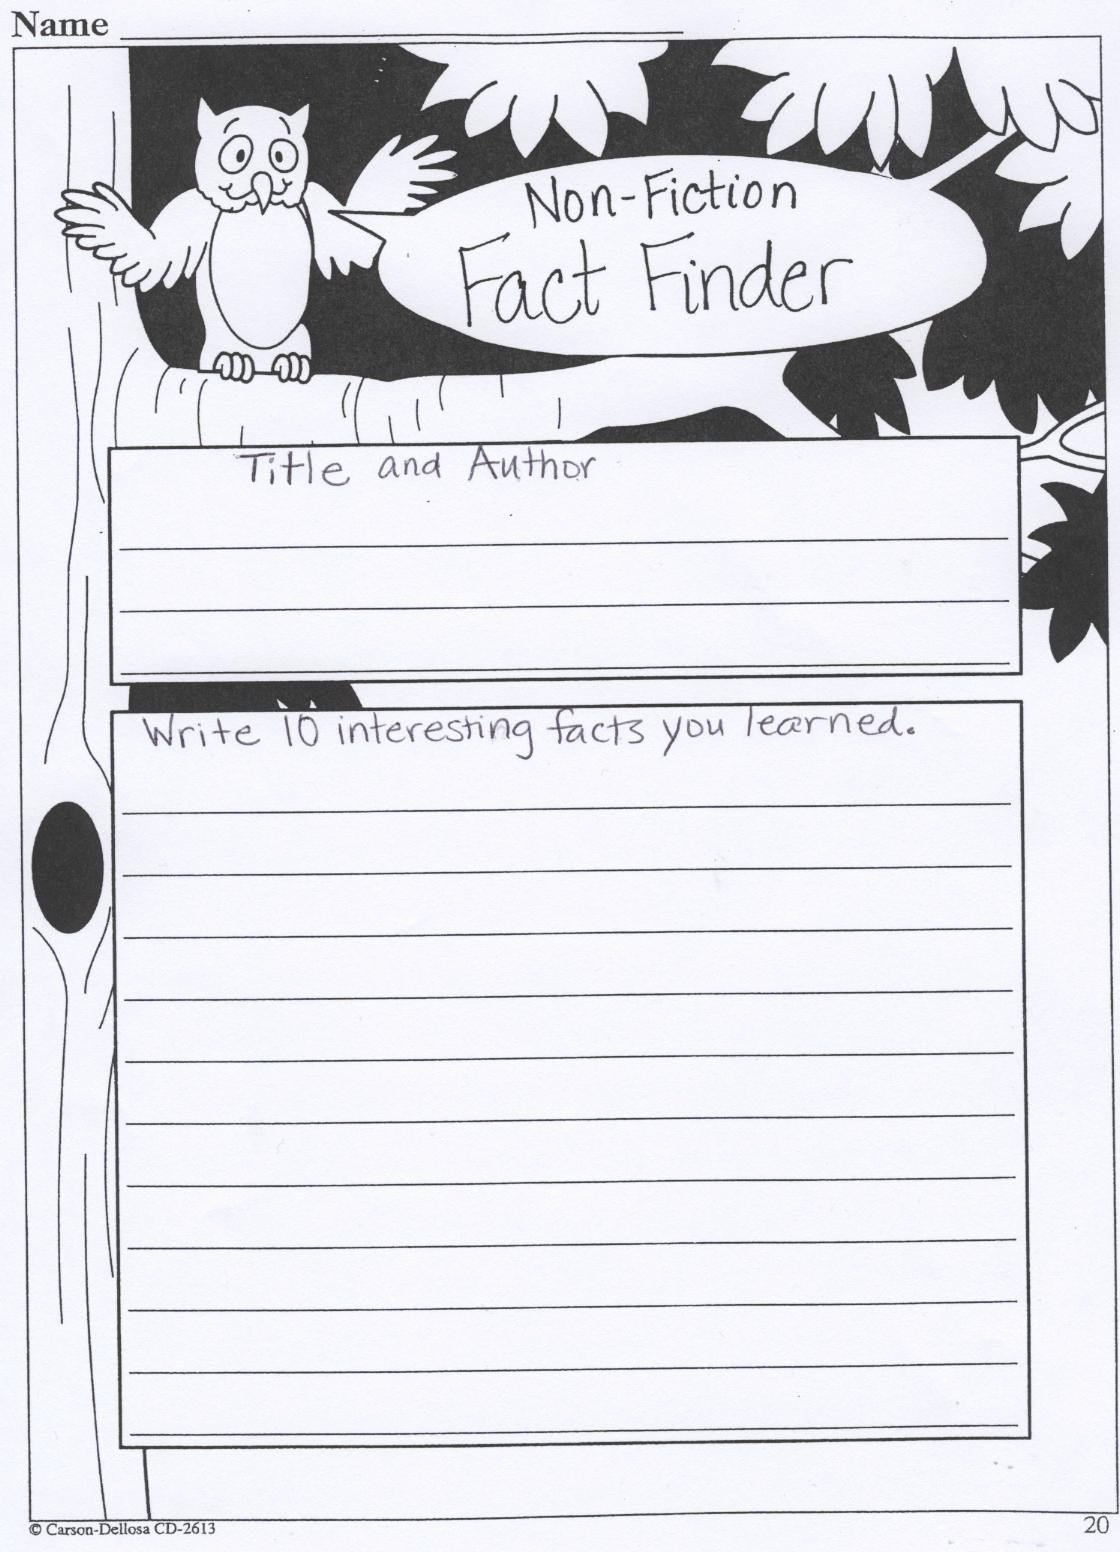 Nonfiction Book Report Template Elegant Ms Hill S Fifth Grade Non Fiction Book Report forms